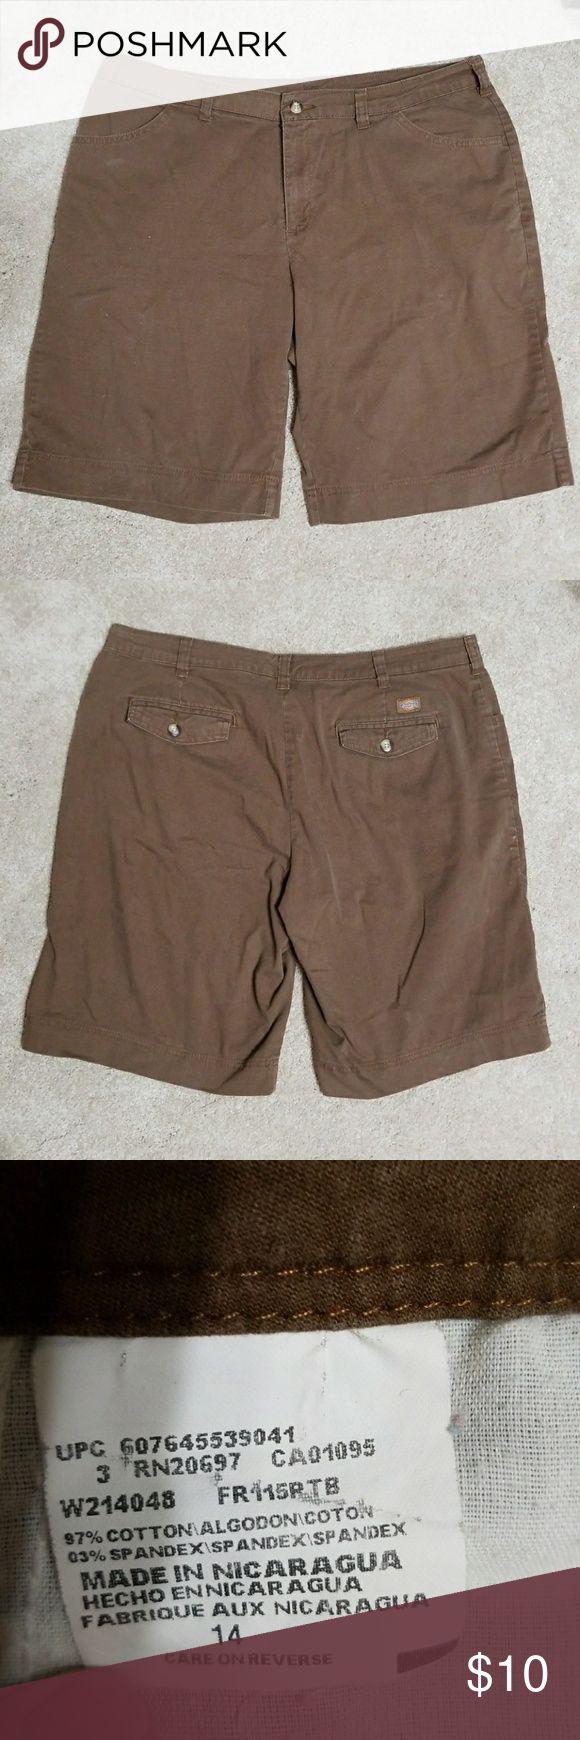 Dickies brown shorts Dickies brown shorts Dickies Shorts